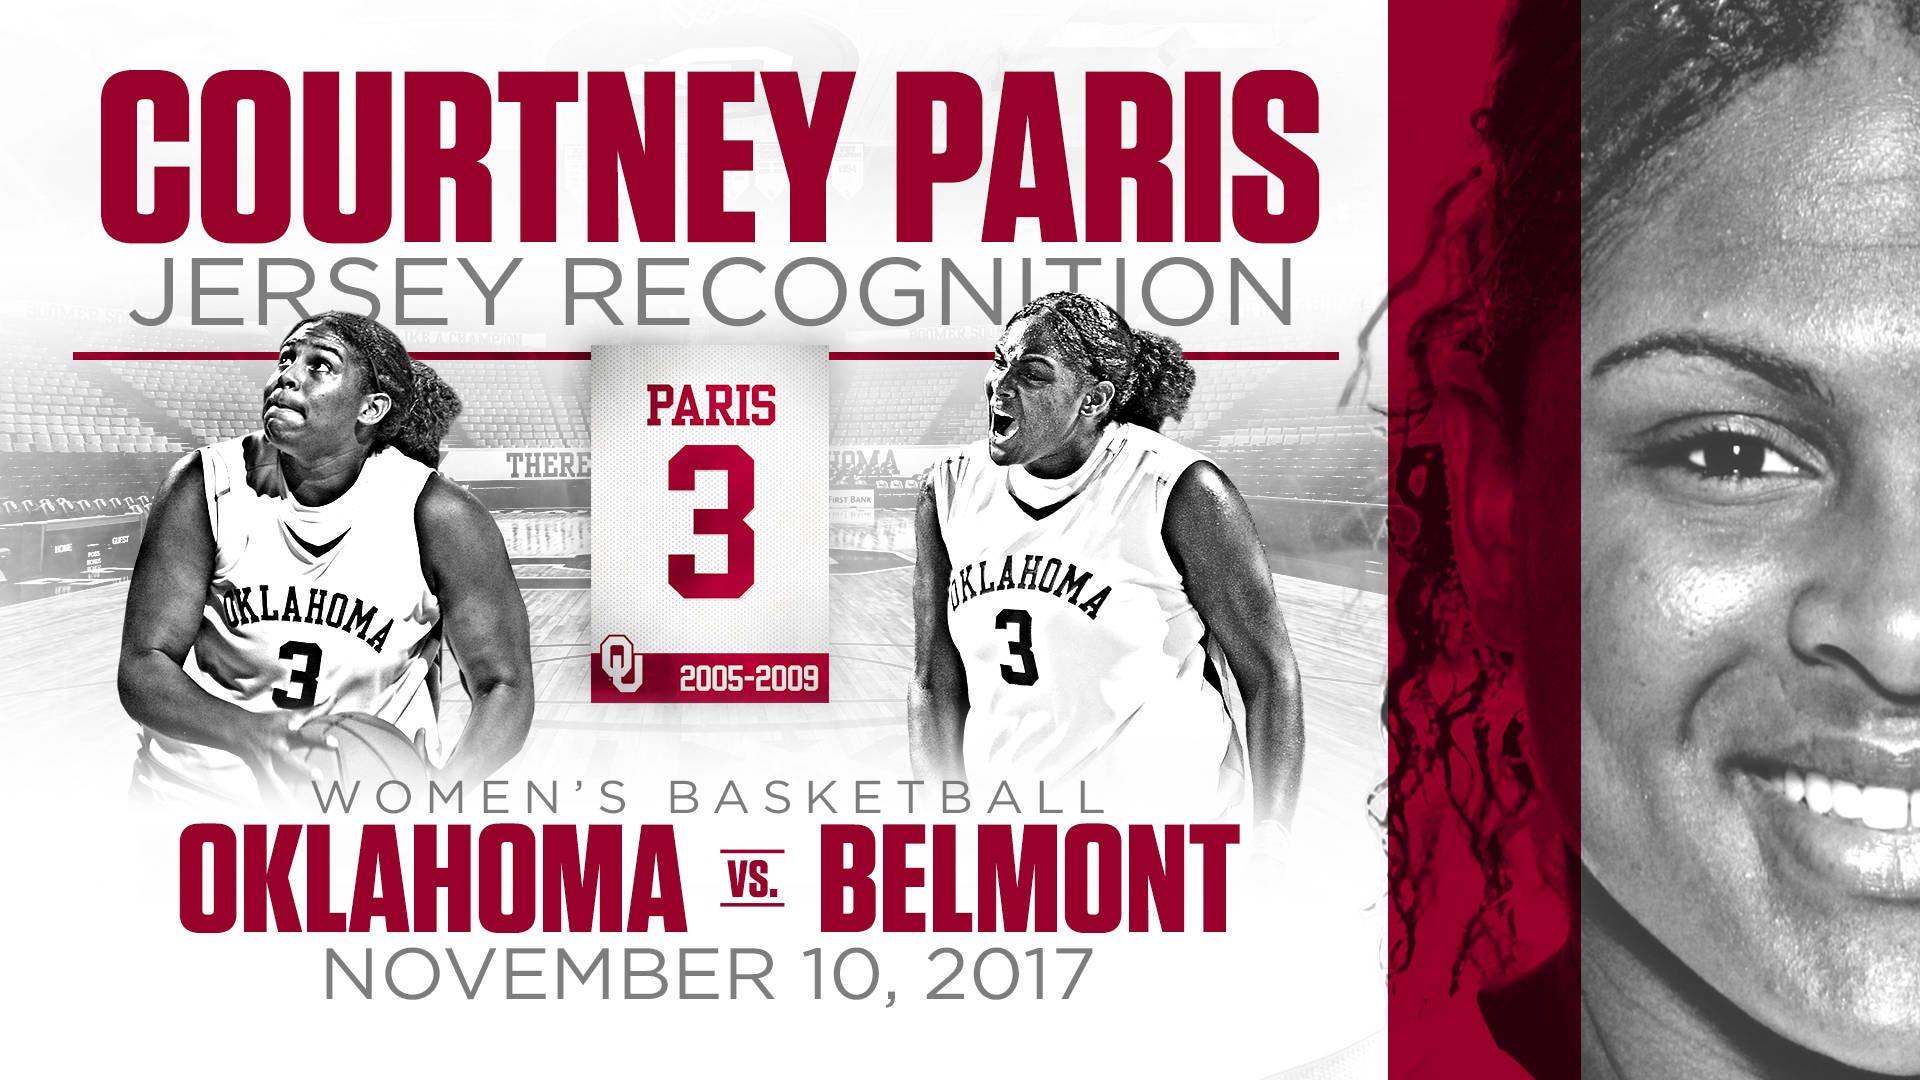 Paris To Return To OU For Jersey Honoring Nov. 10